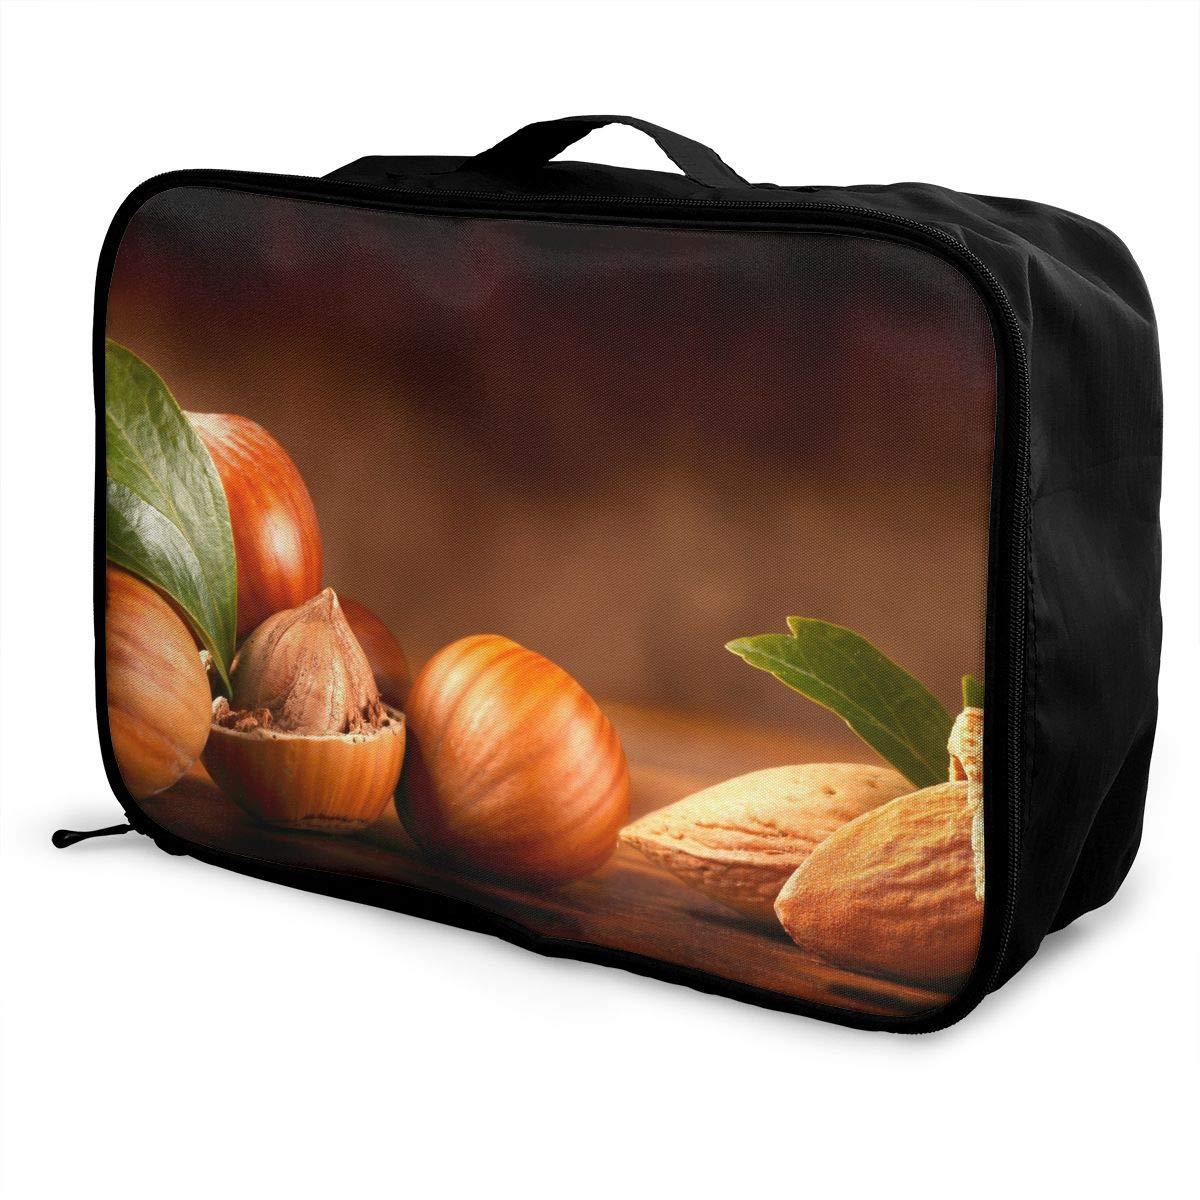 Travel Luggage Duffle Bag Lightweight Portable Handbag Nut Large Capacity Waterproof Foldable Storage Tote